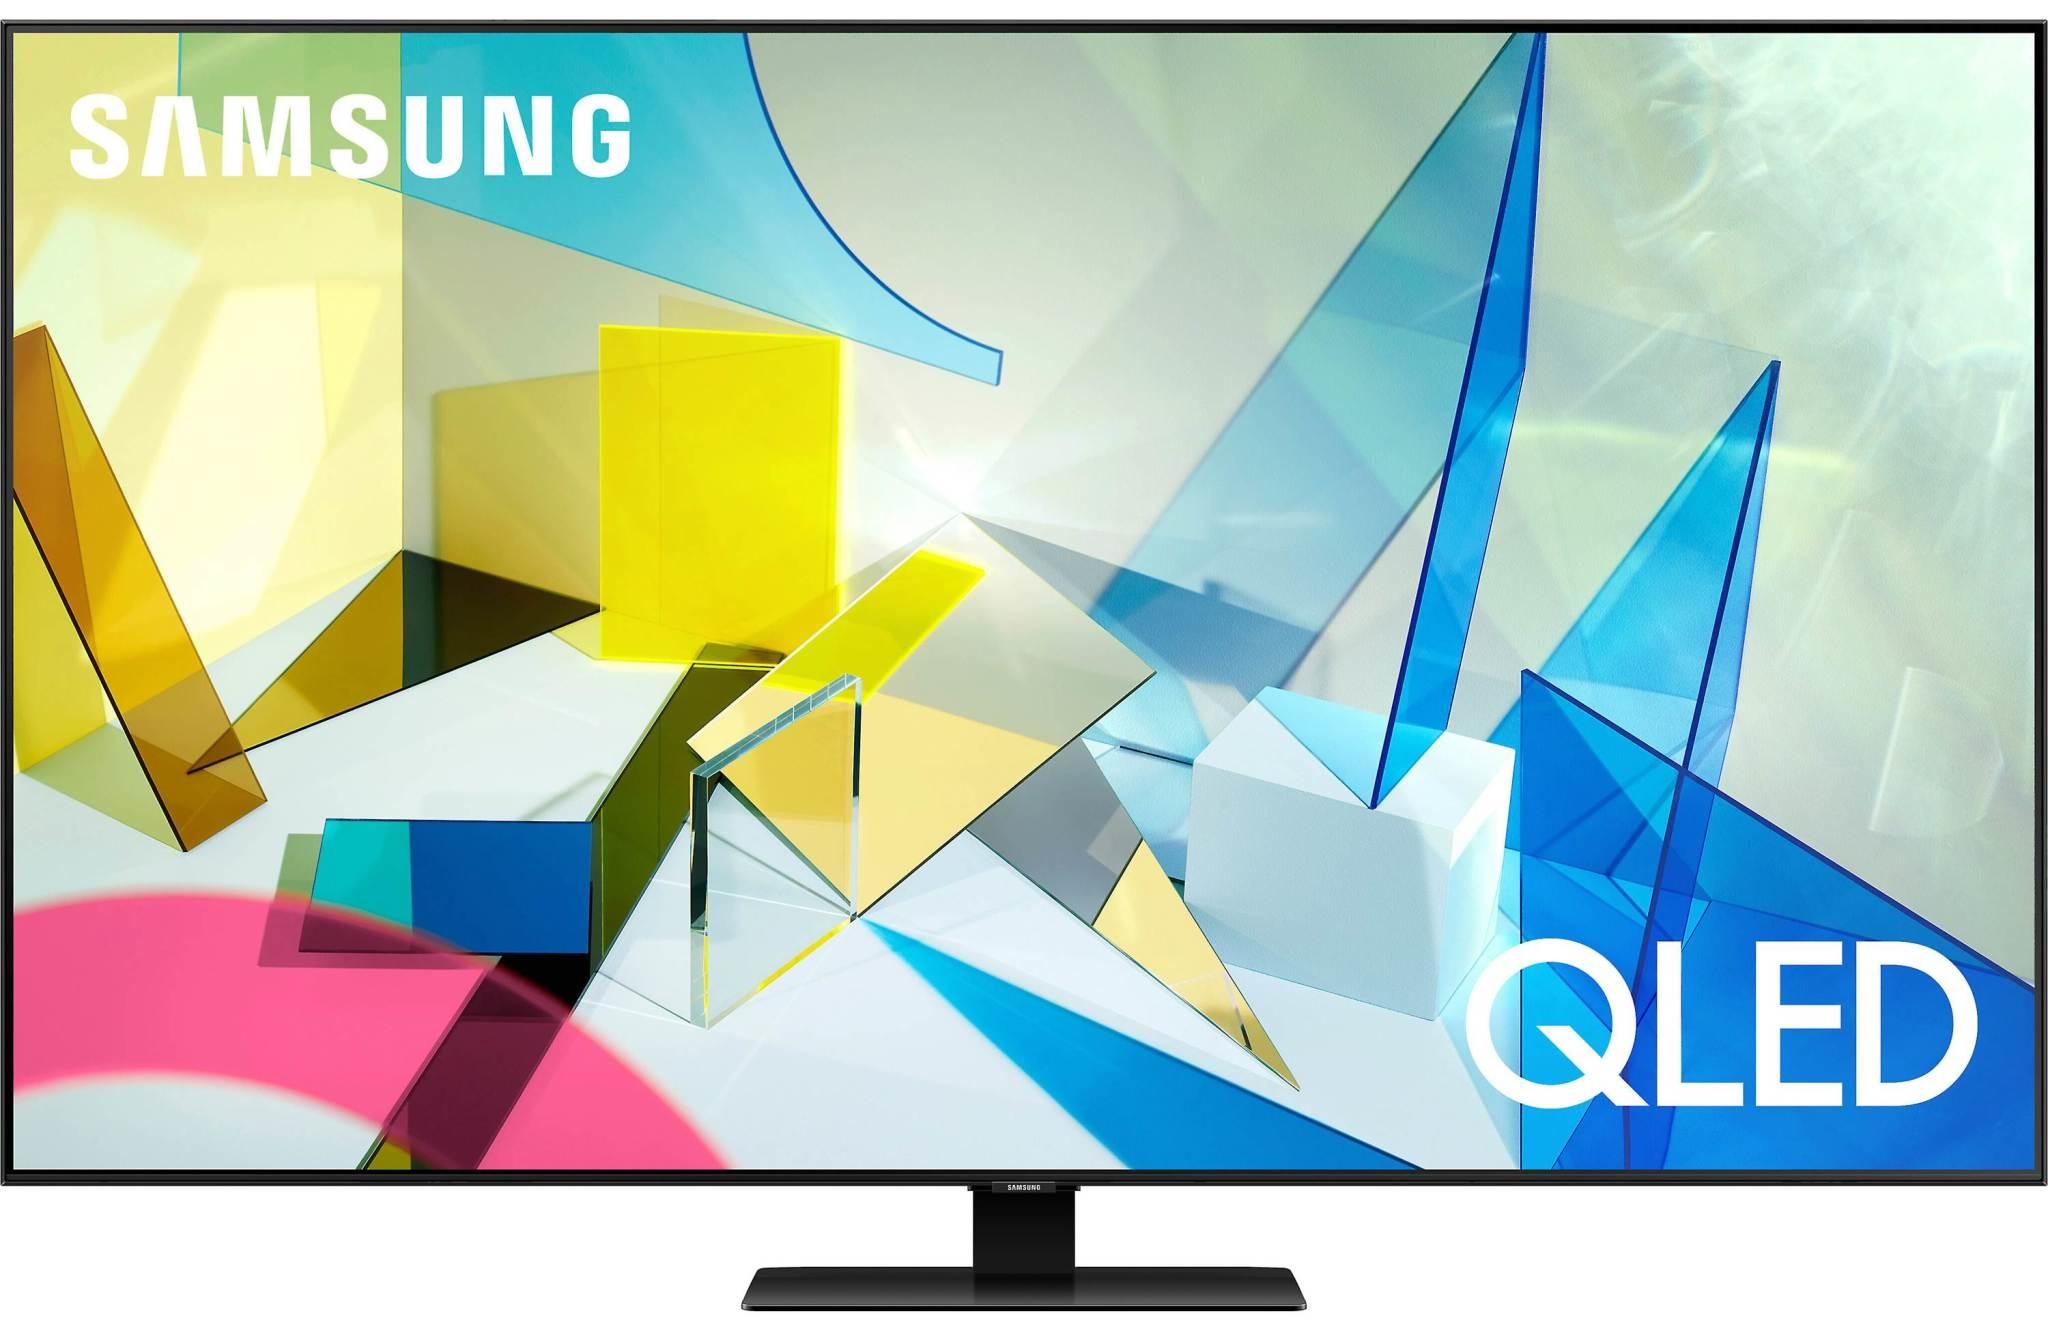 Samsung QN55Q80T QLED 4K HDR Smart TV